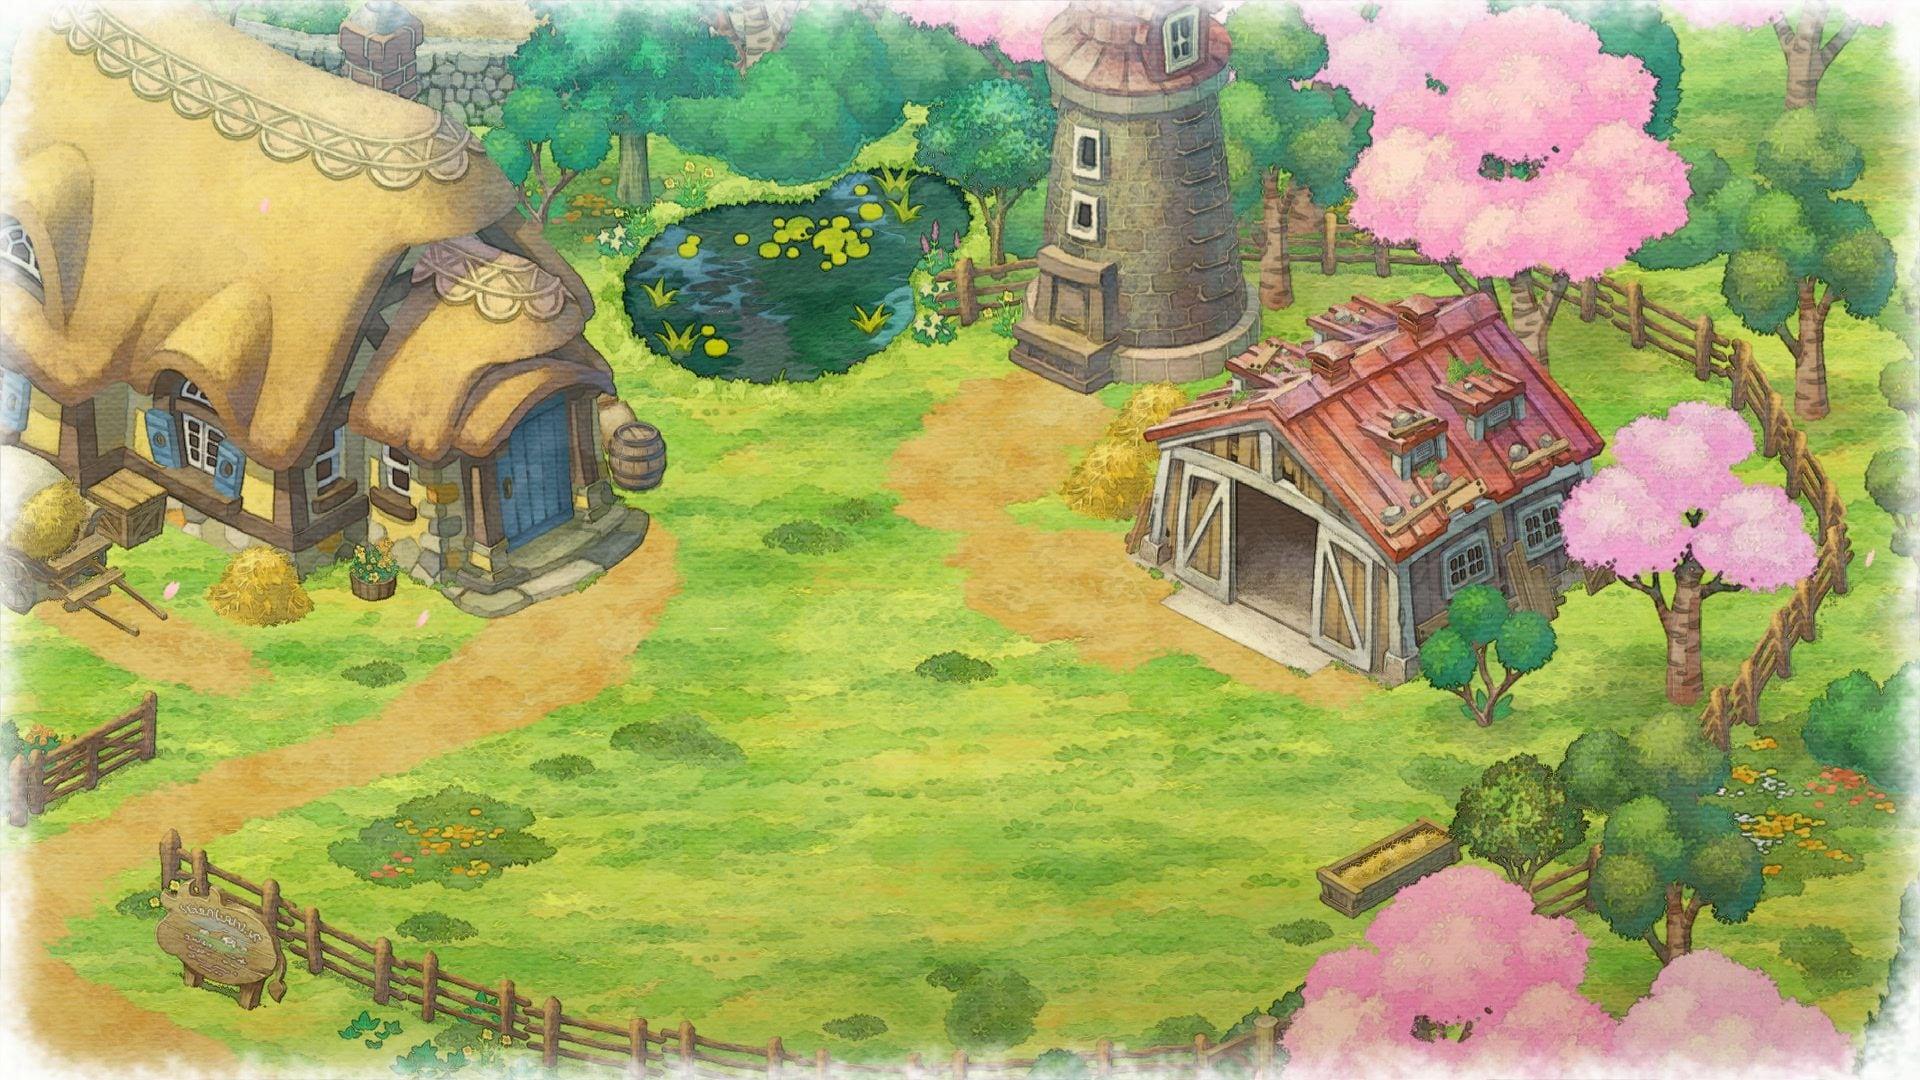 doraemon-story-of-seasons-immagini-017